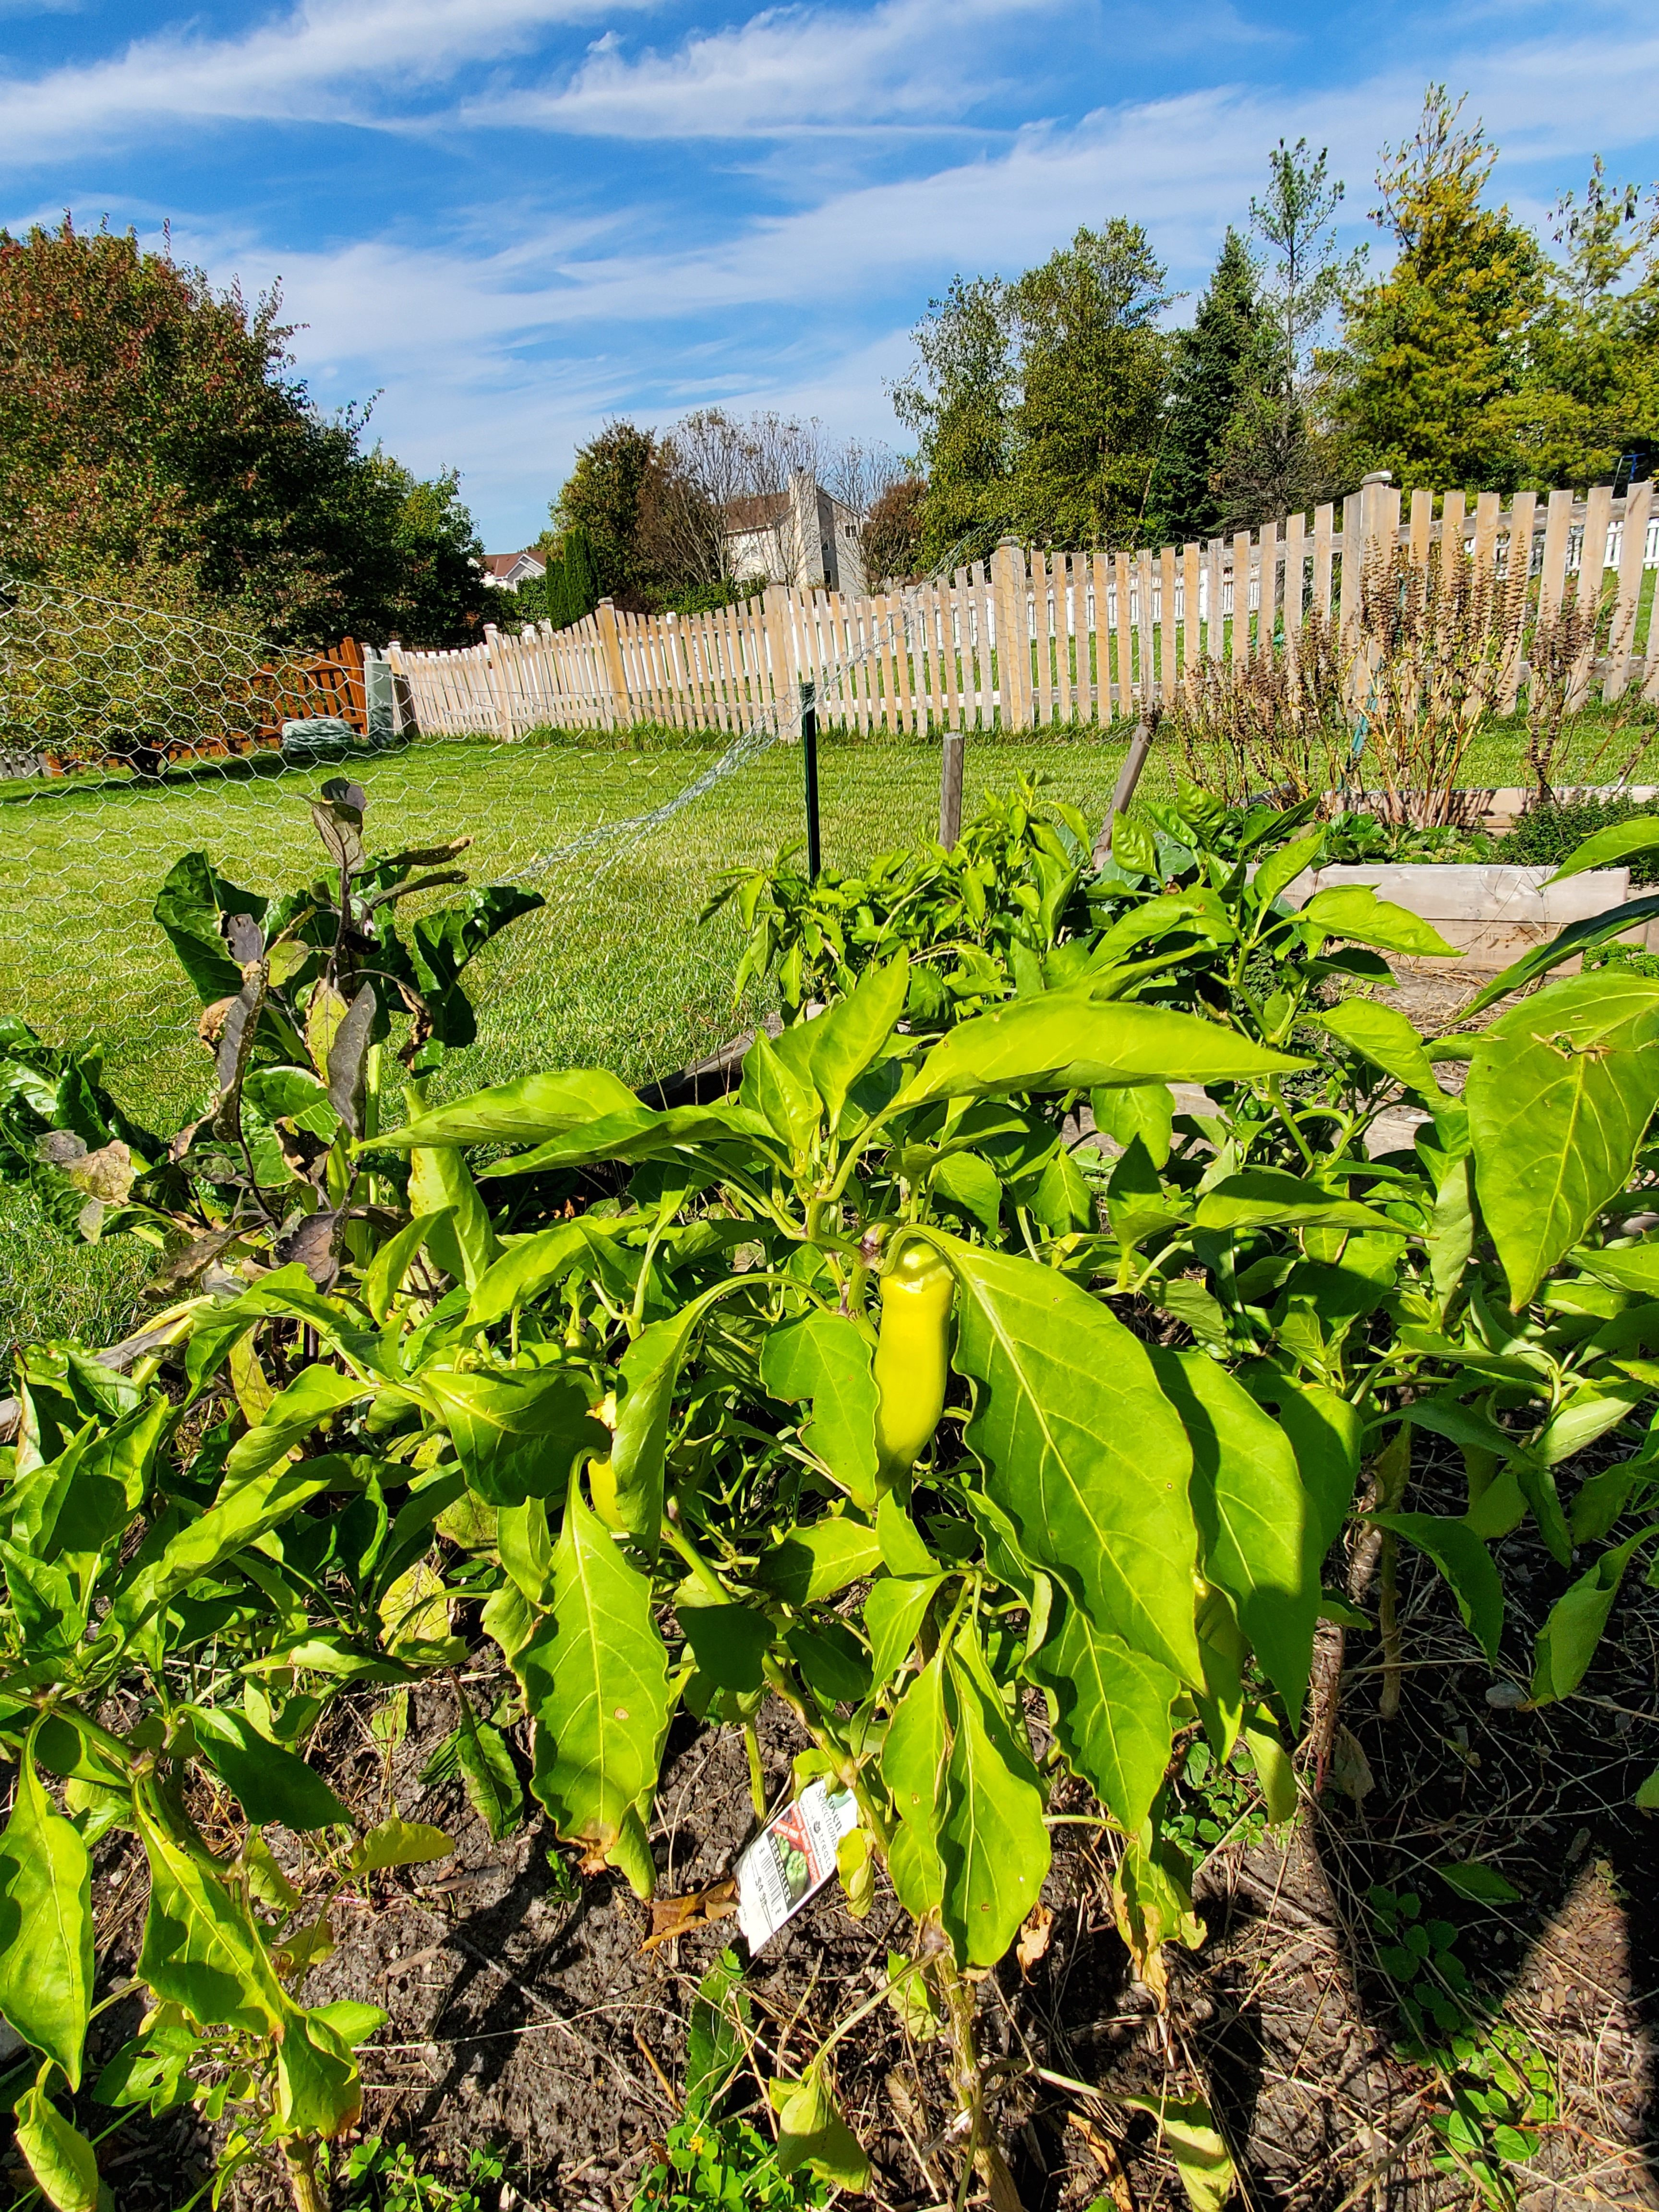 Earth Stewardship Project Story Pic 4 Greg Reiva